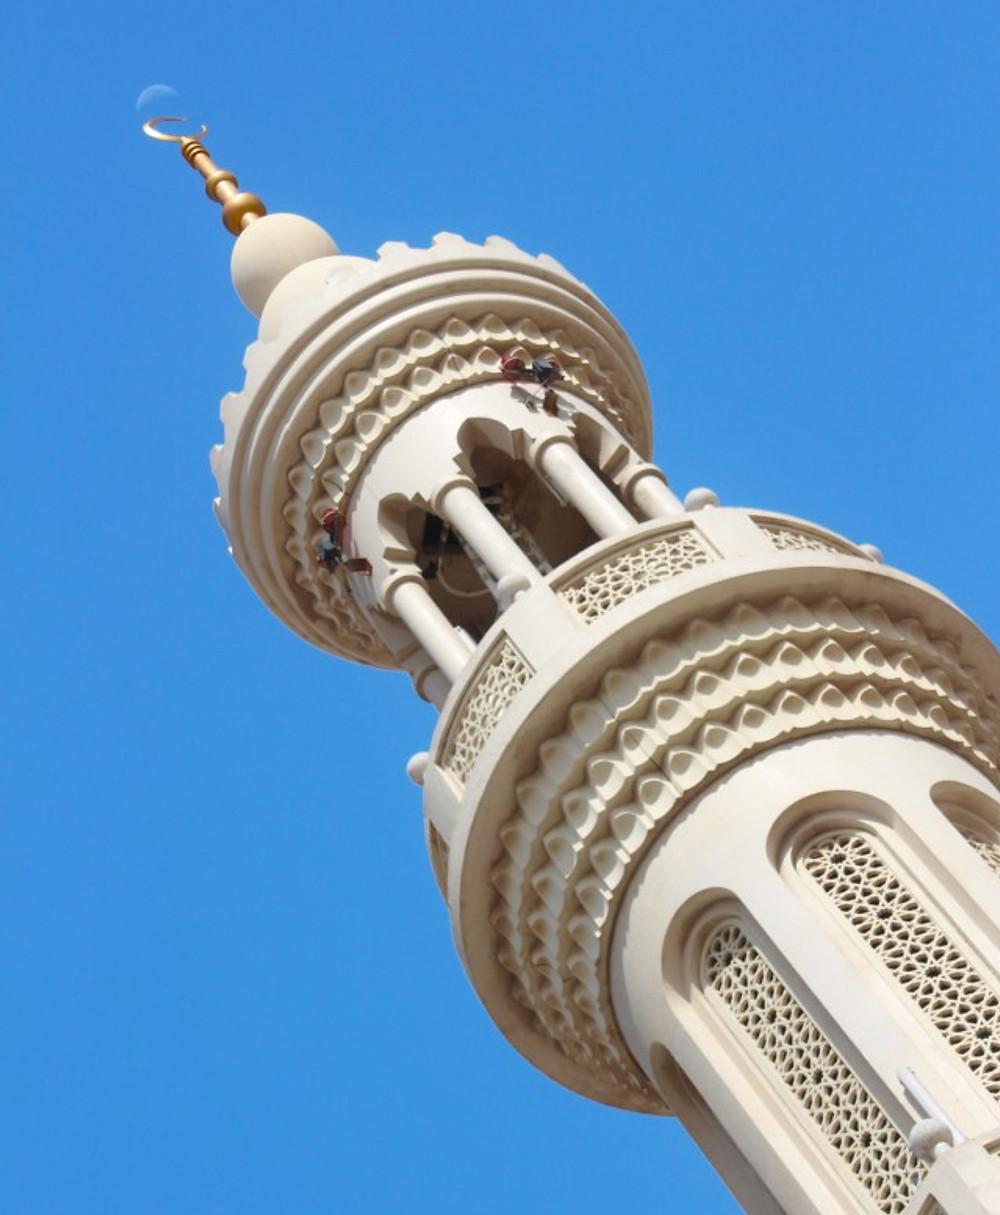 Moon over Al Shahama Mosque